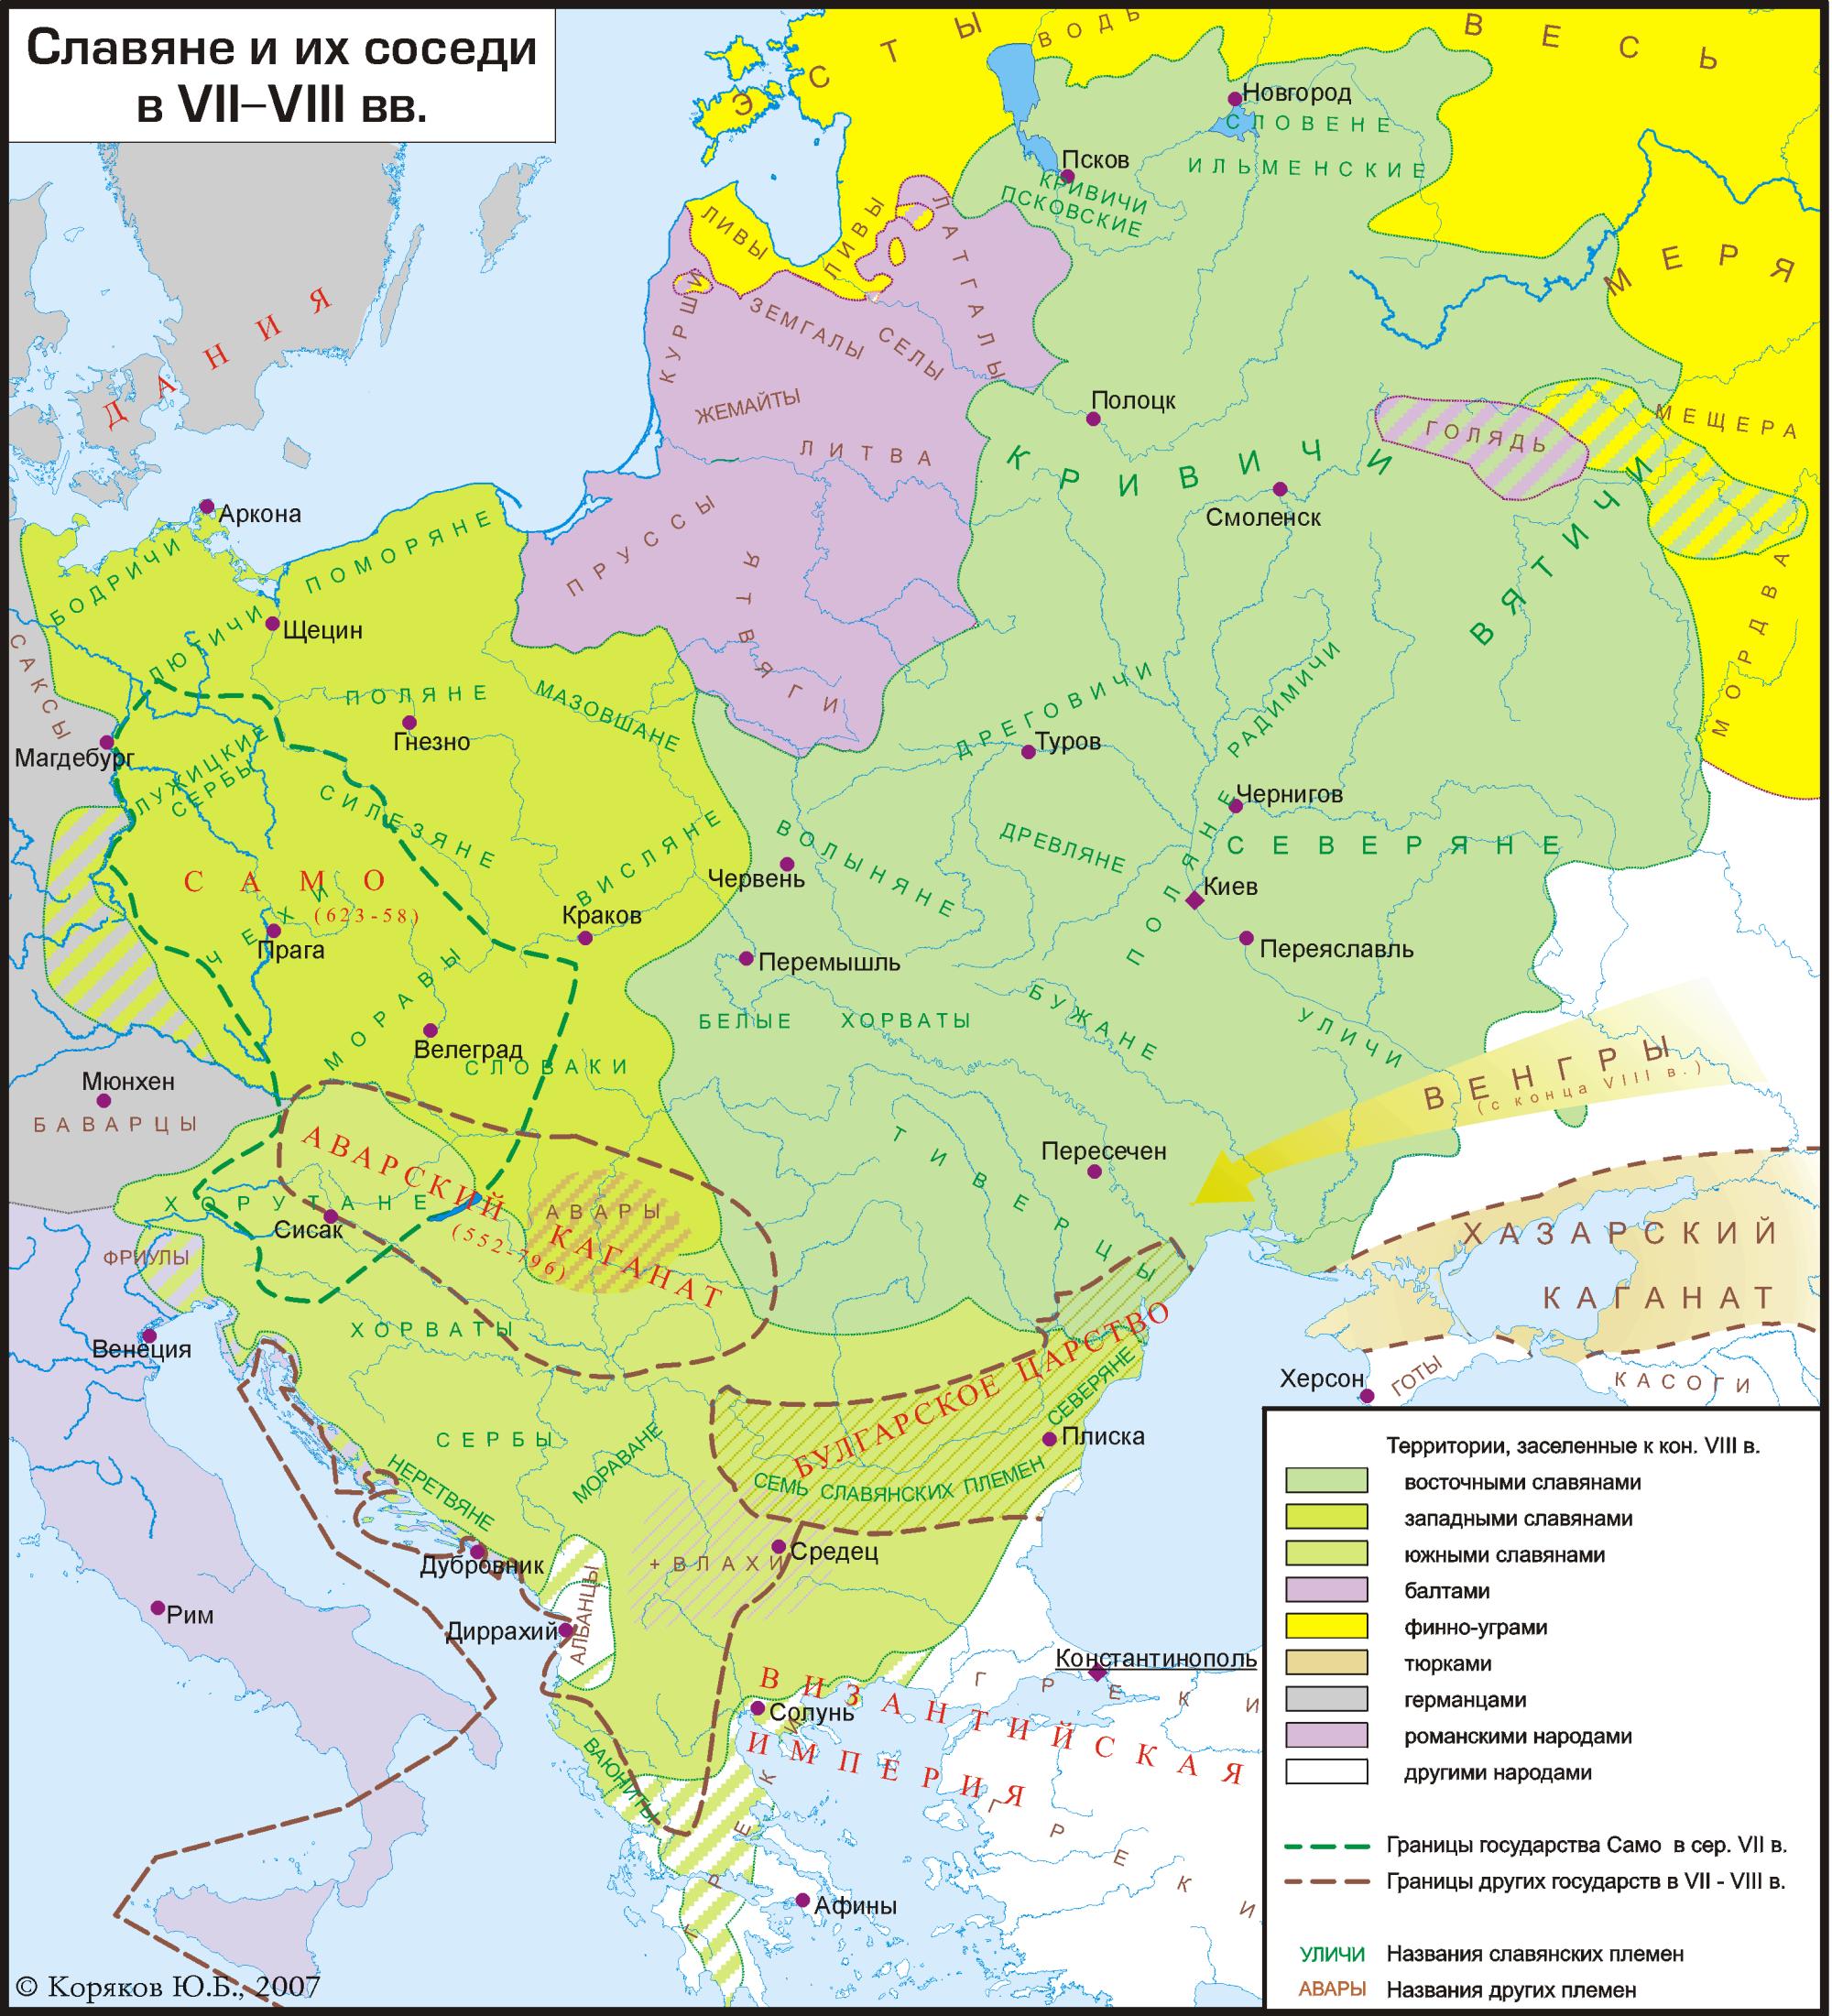 Восточнославянские племена и их соседи на карте